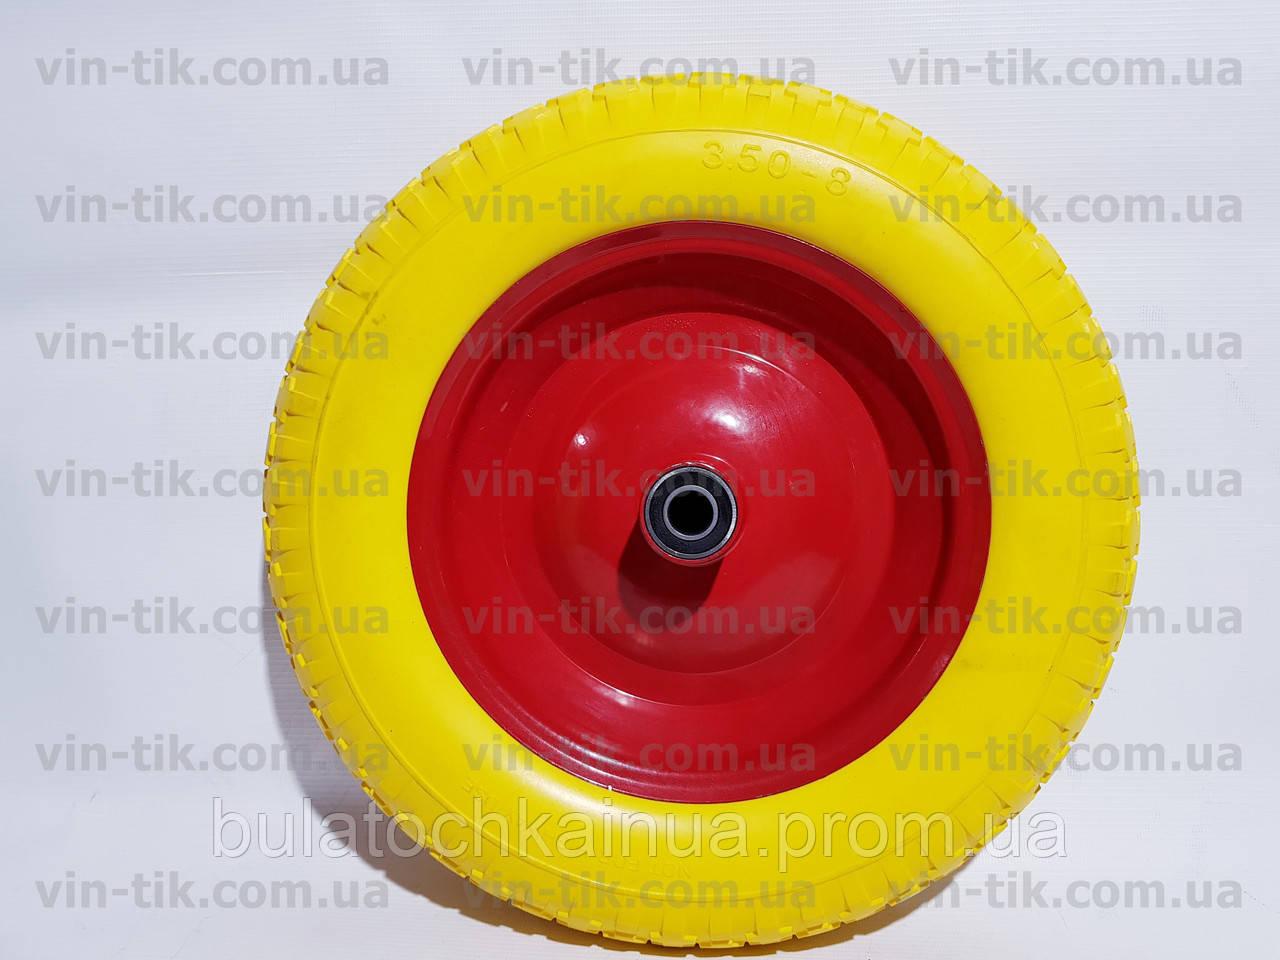 Колесо для тачки пенополиуретан 3.50-8